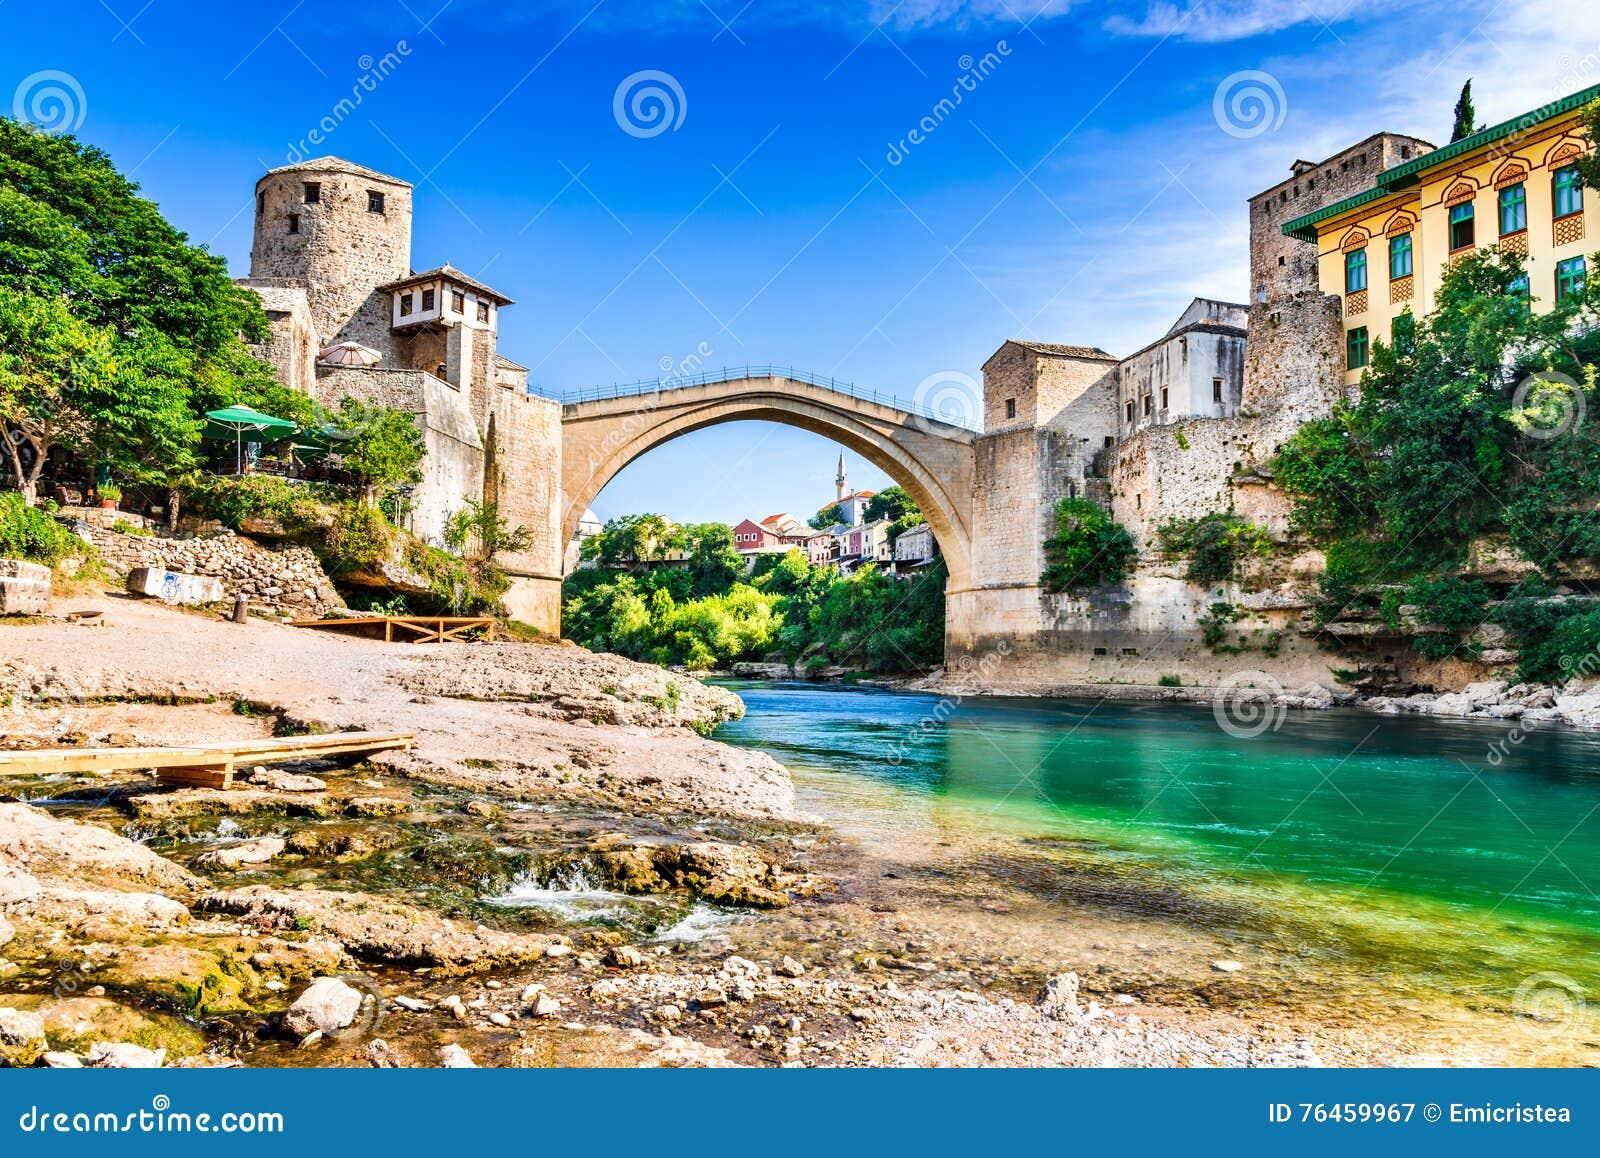 Mostar, Bosnia and Herzegovina - Stari Most, Old Bridge